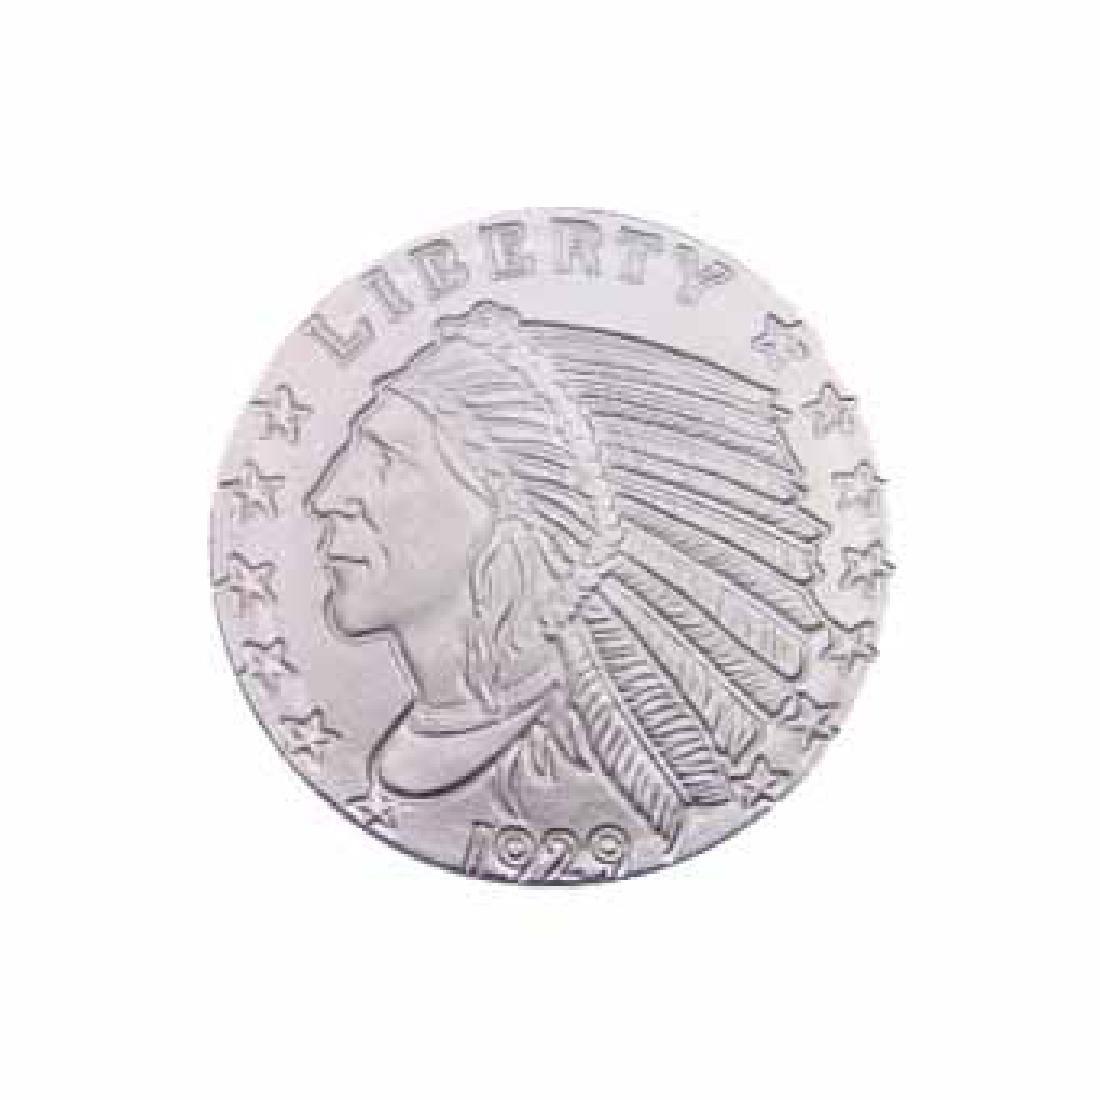 Silver Bullion 1/10 oz Incuse Indian Round .999 Fine